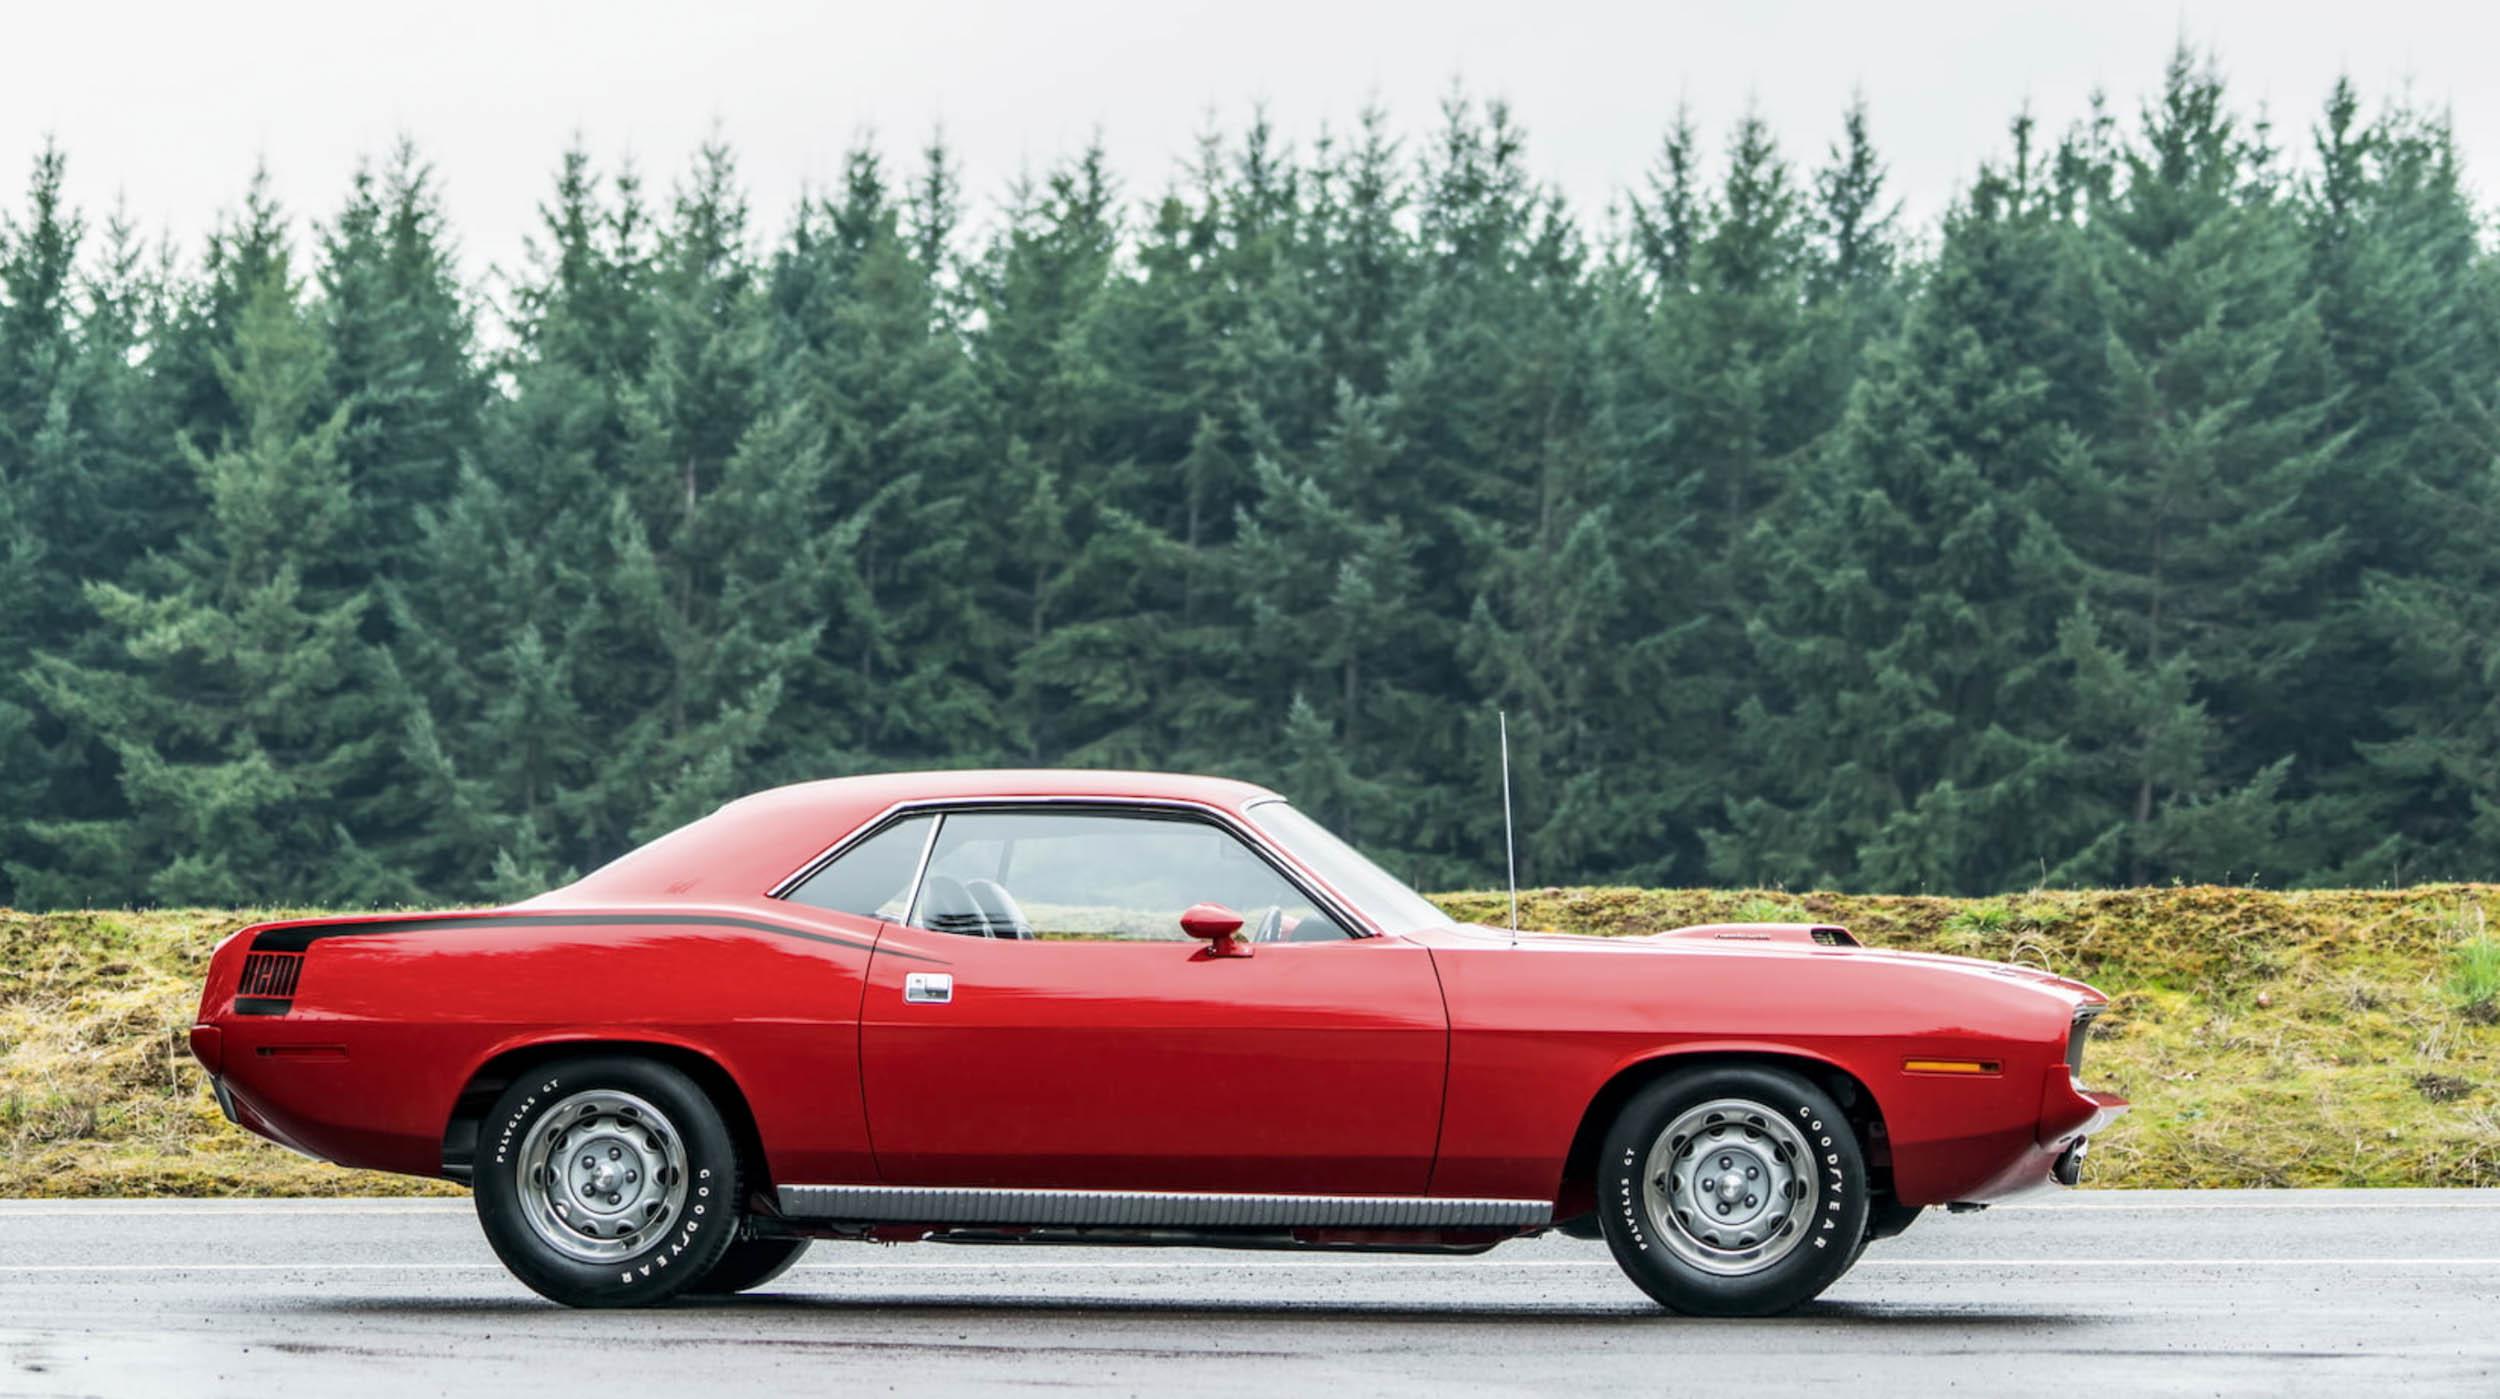 1970 Plymouth Cuda Hemi